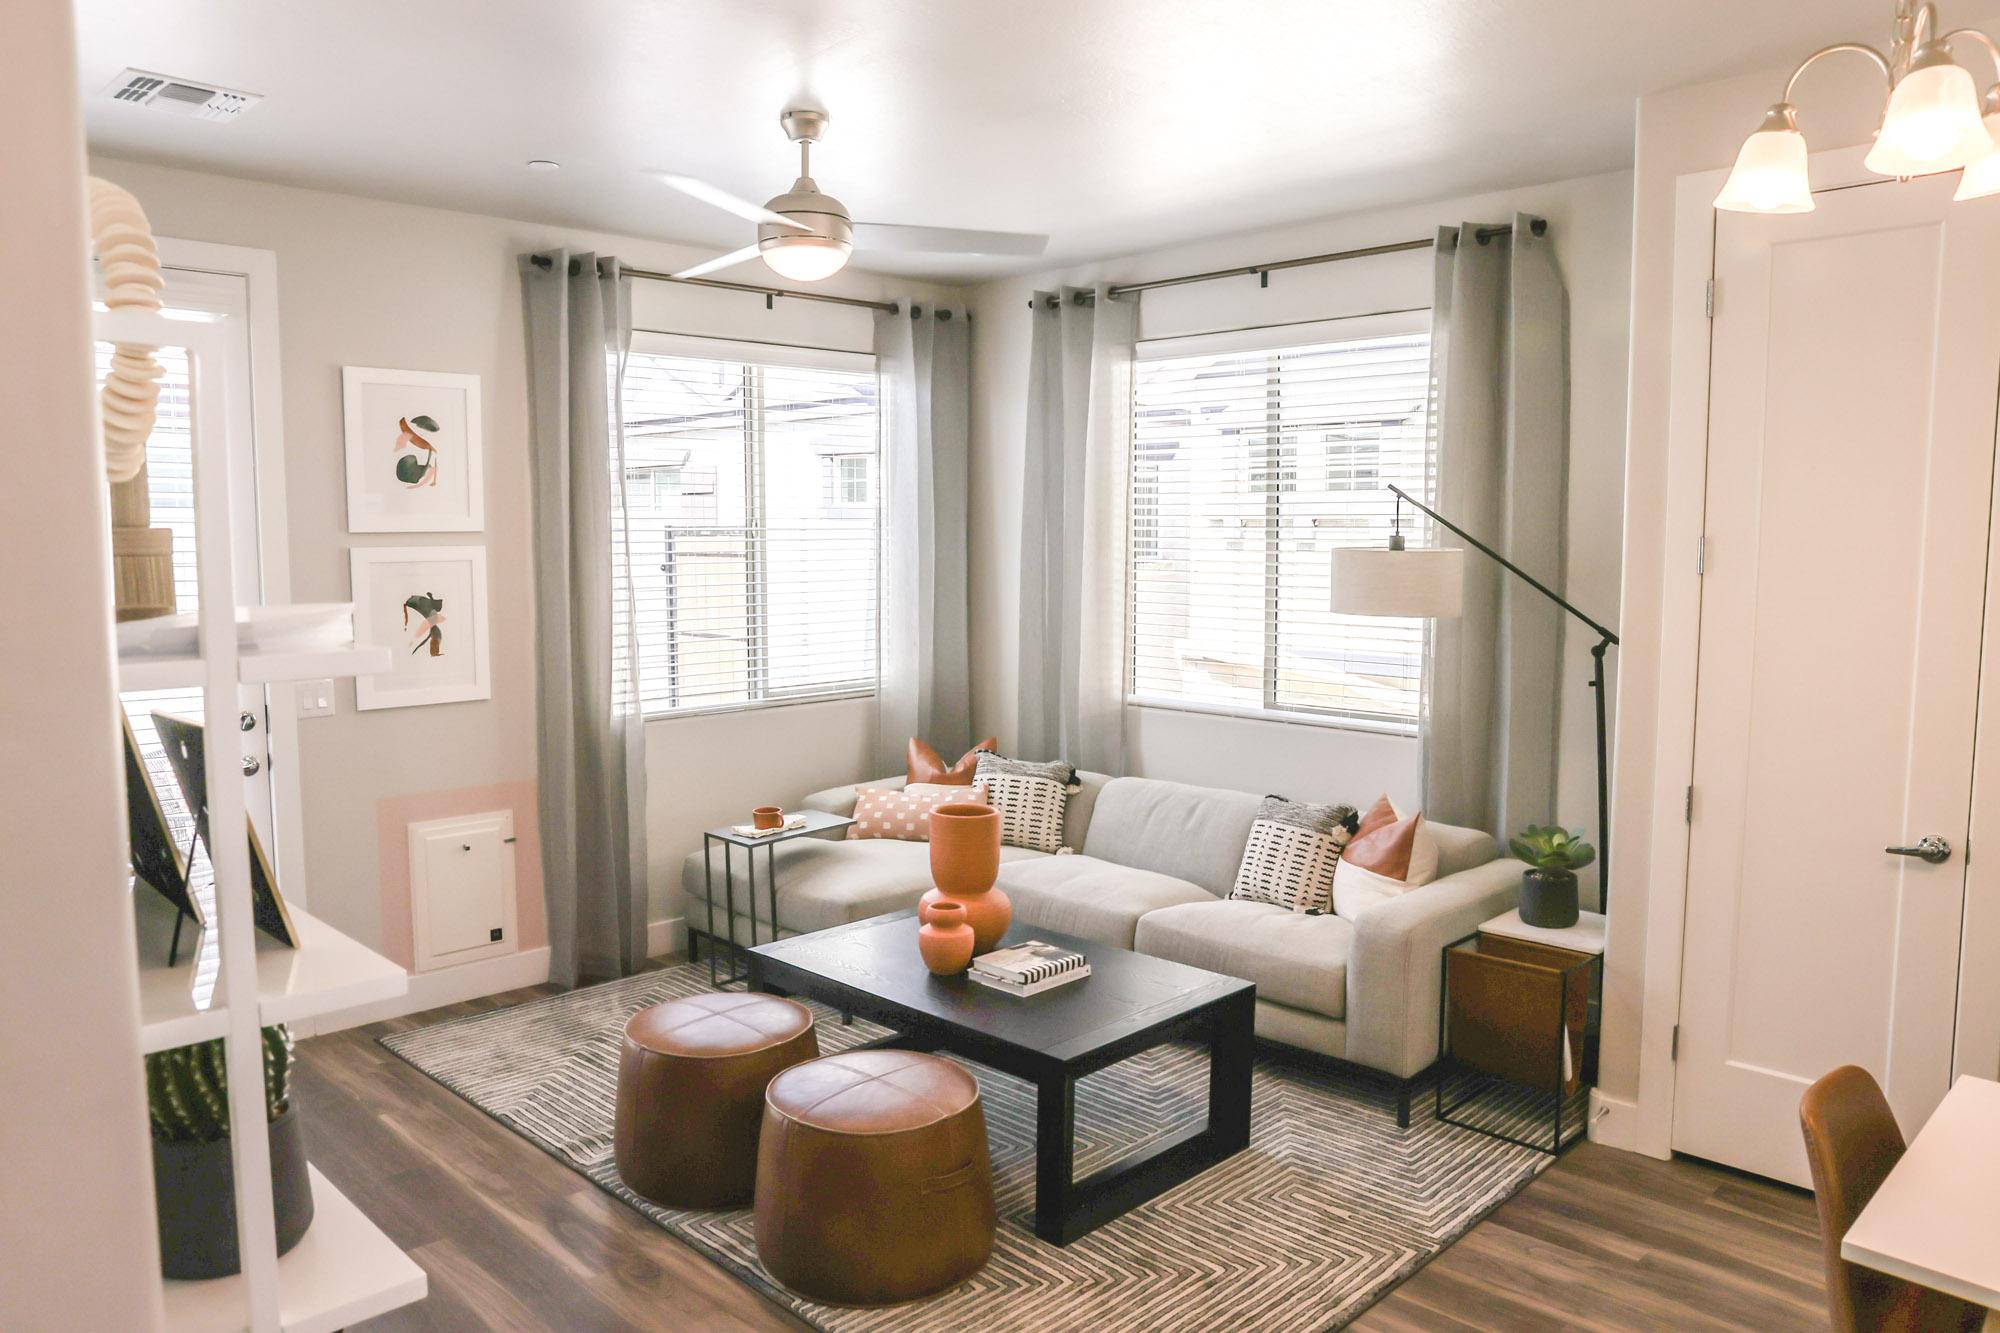 LIving Room at Village at Olive Marketplace Apartments in Glendale, AZ